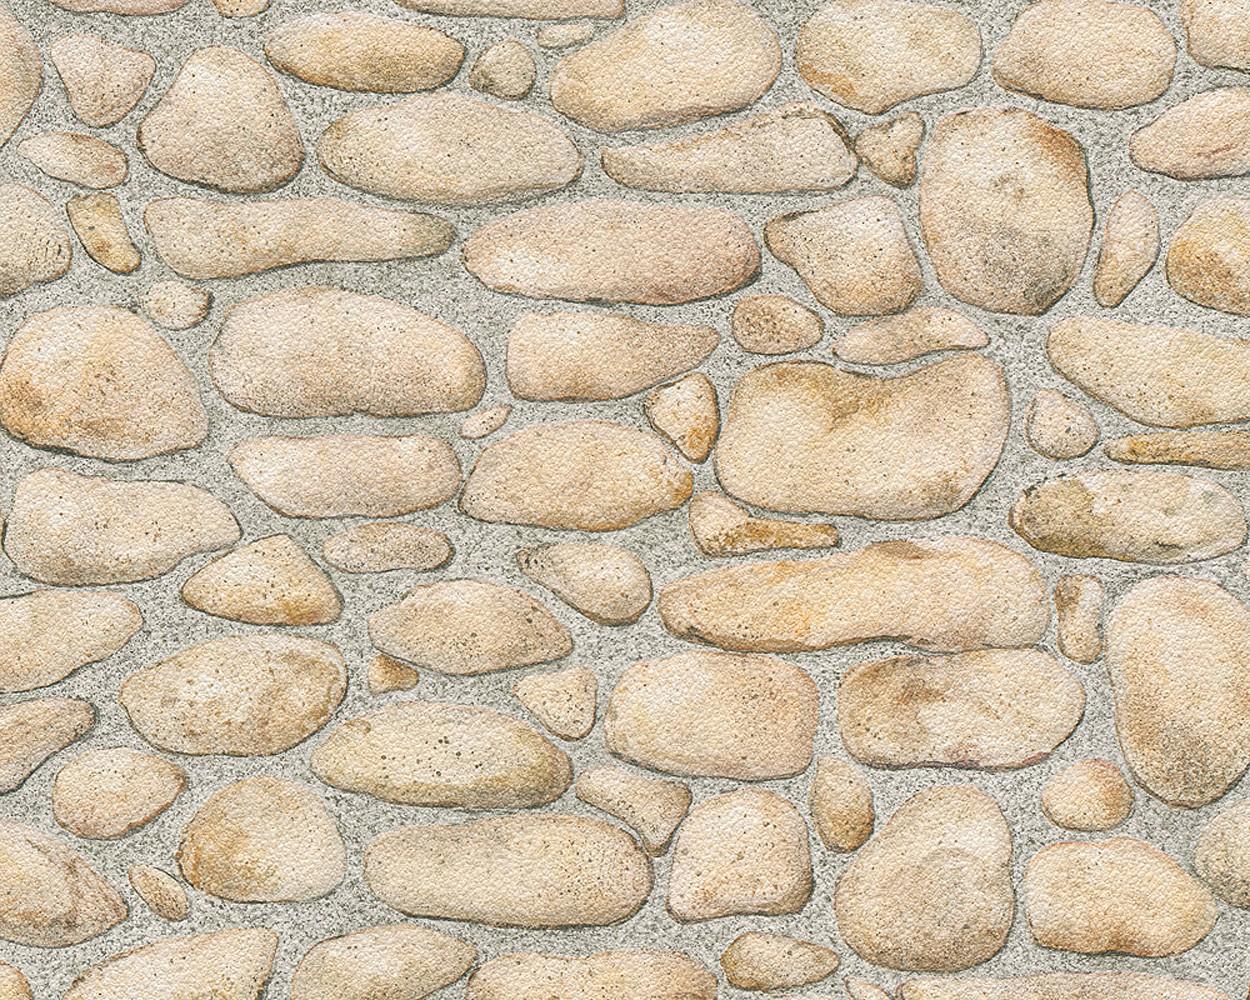 tapete beige grau stein as creation 8345 15. Black Bedroom Furniture Sets. Home Design Ideas